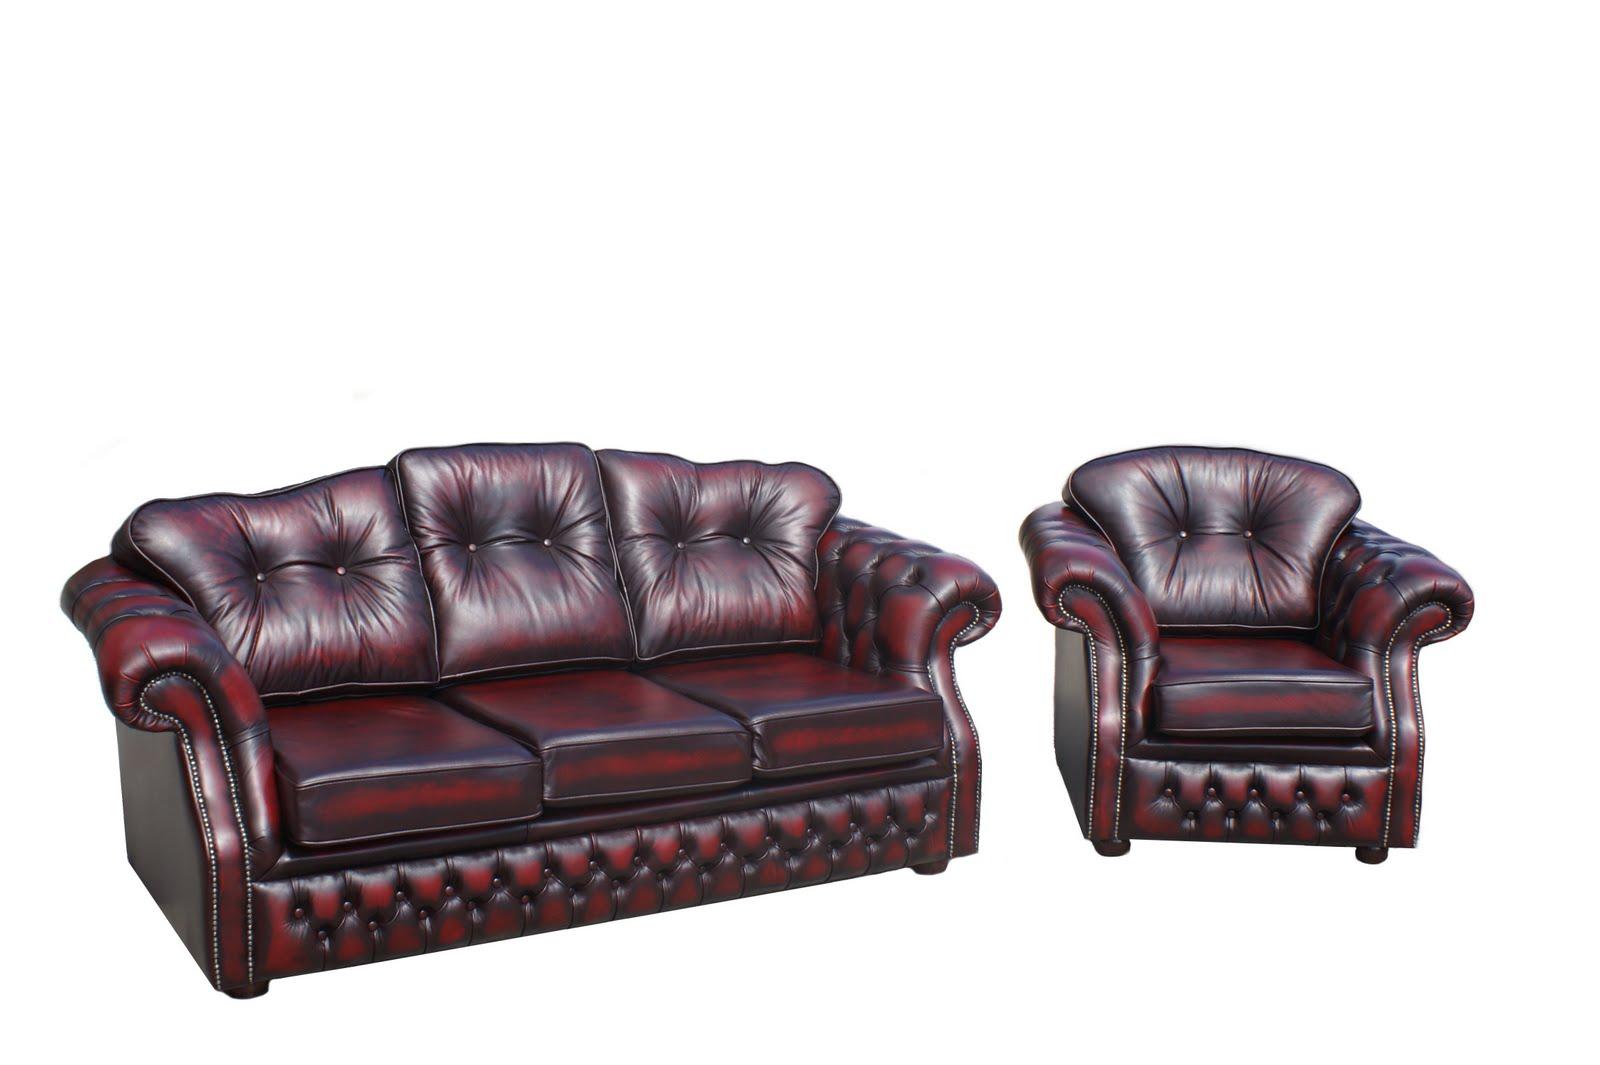 Chesterfield Sofas: Chesterfield Sofa on Craiglist